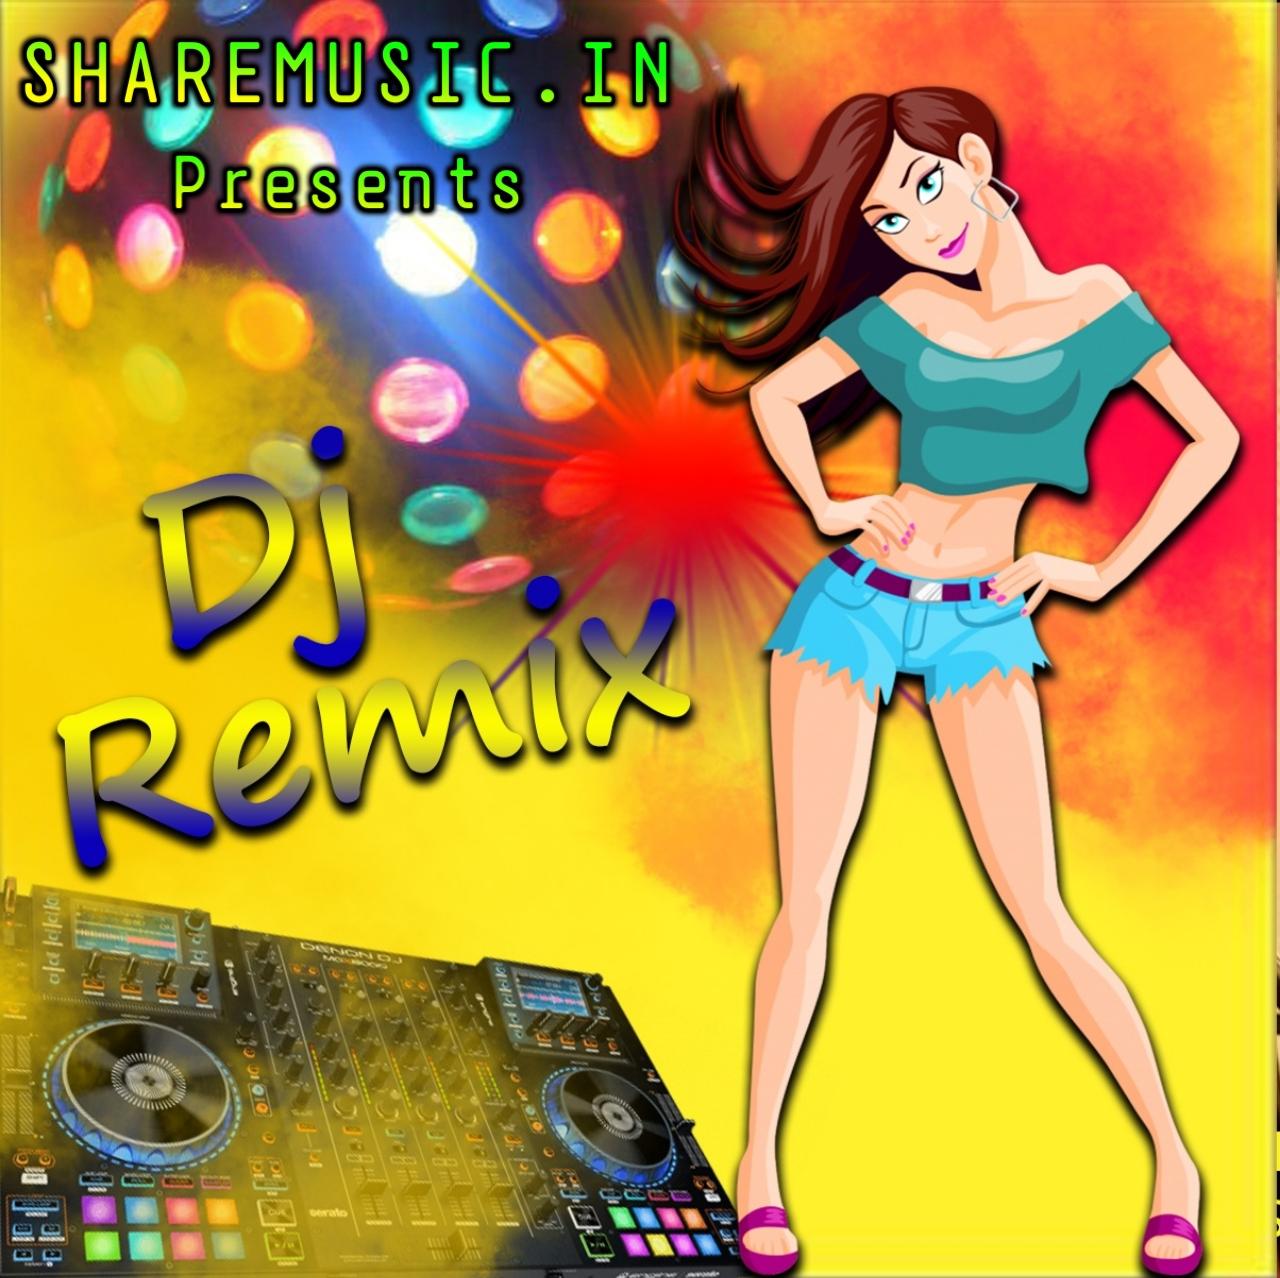 KHECHEDA KALA MATE (MATAL DANCE MIX) DJ BANTY KDP